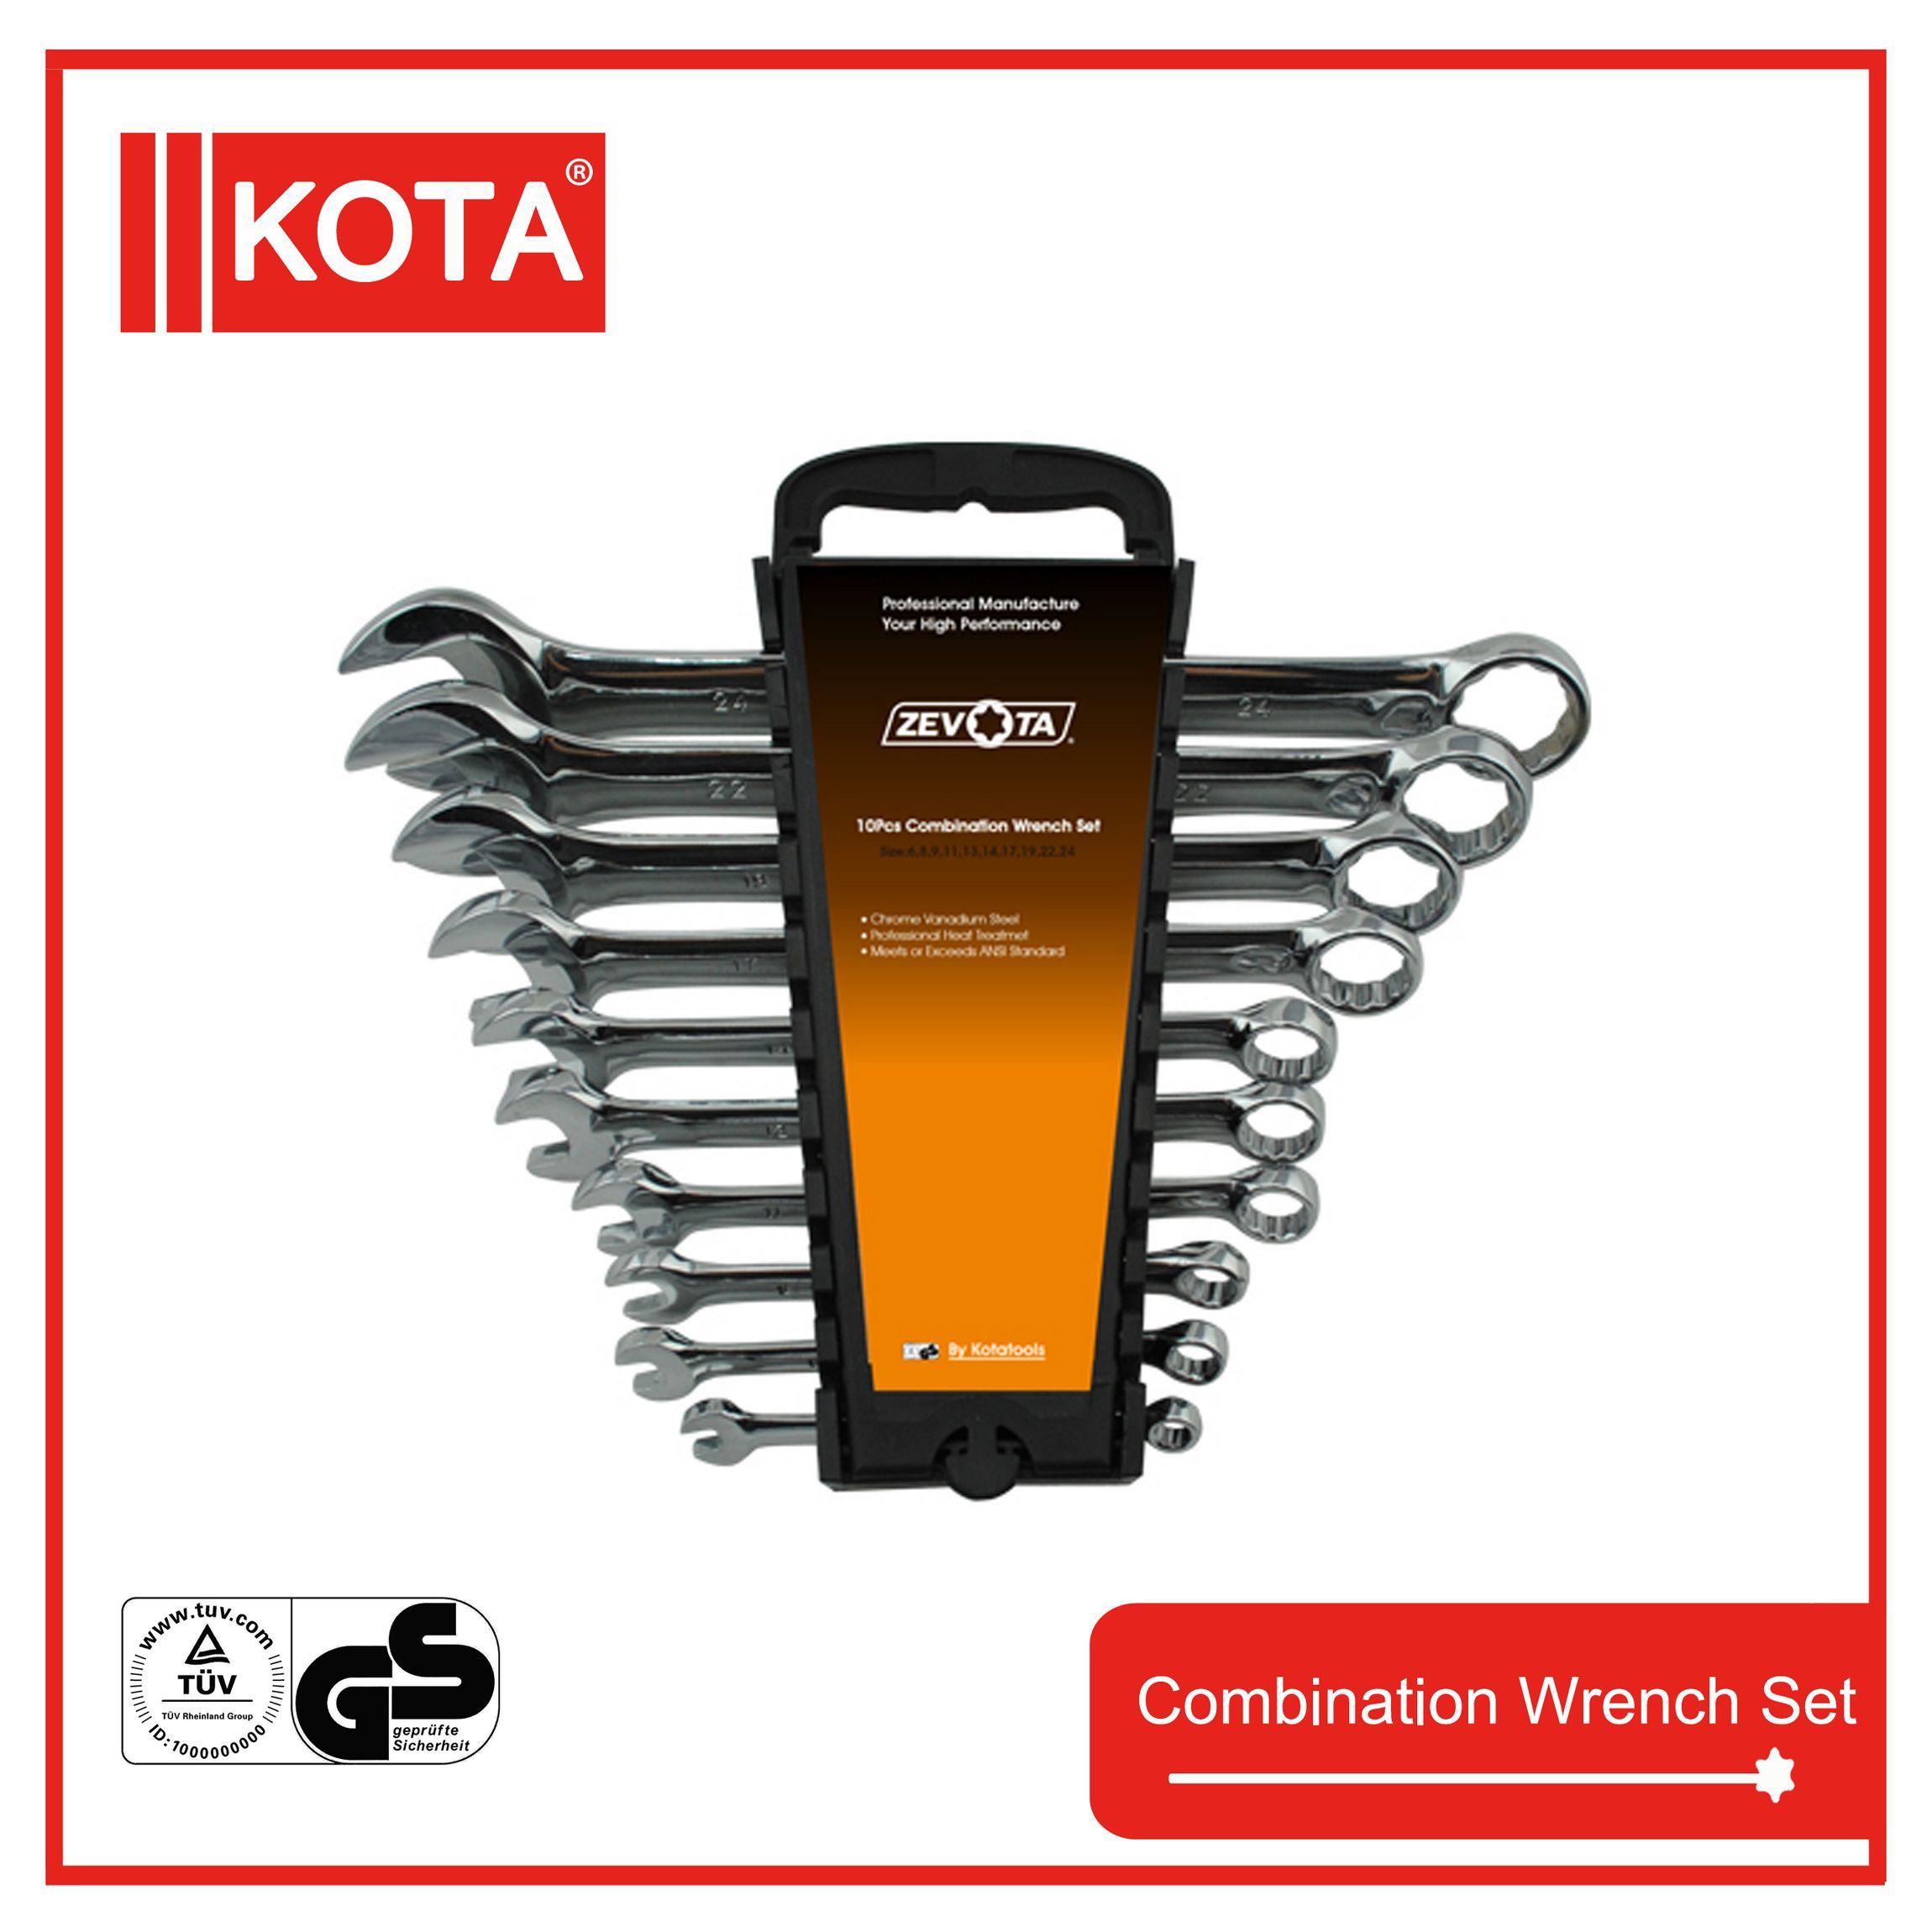 finish 6 chrome vanadium steel adjustable wrench unversial wrench